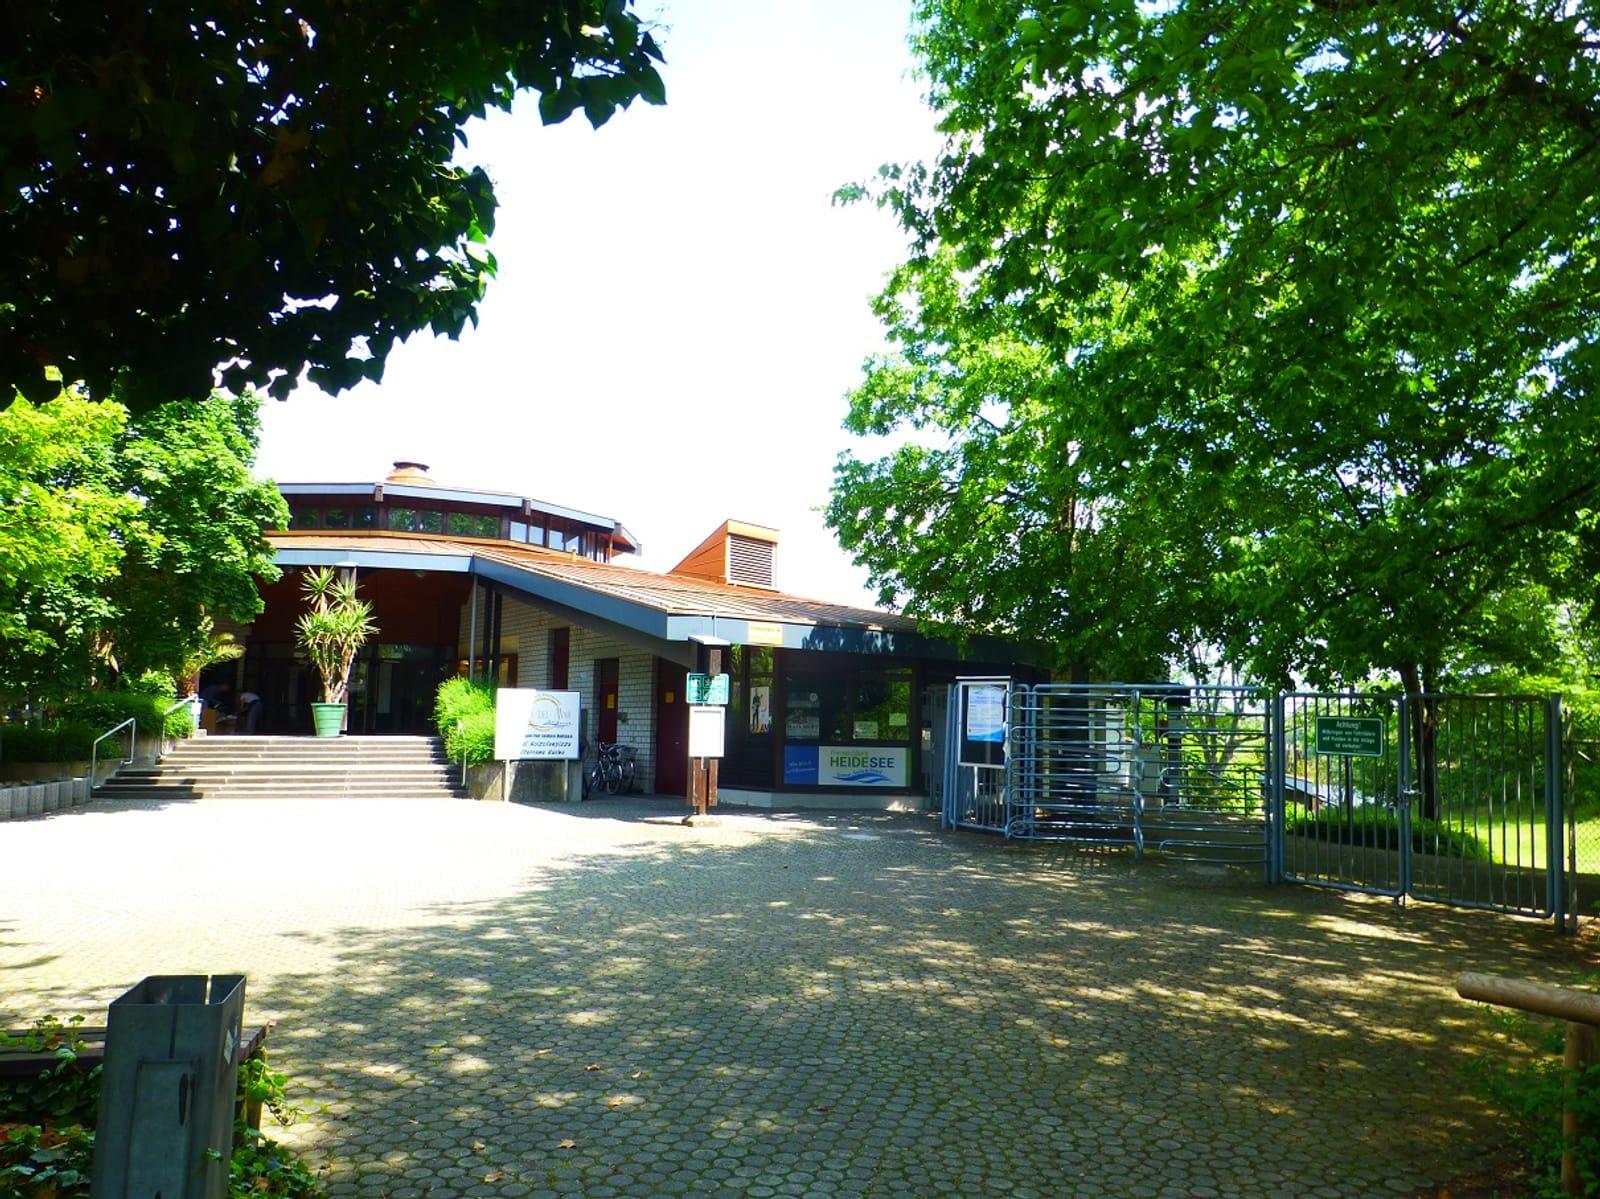 Tagesticketshop Heidesee (Di. 01.09.2020)